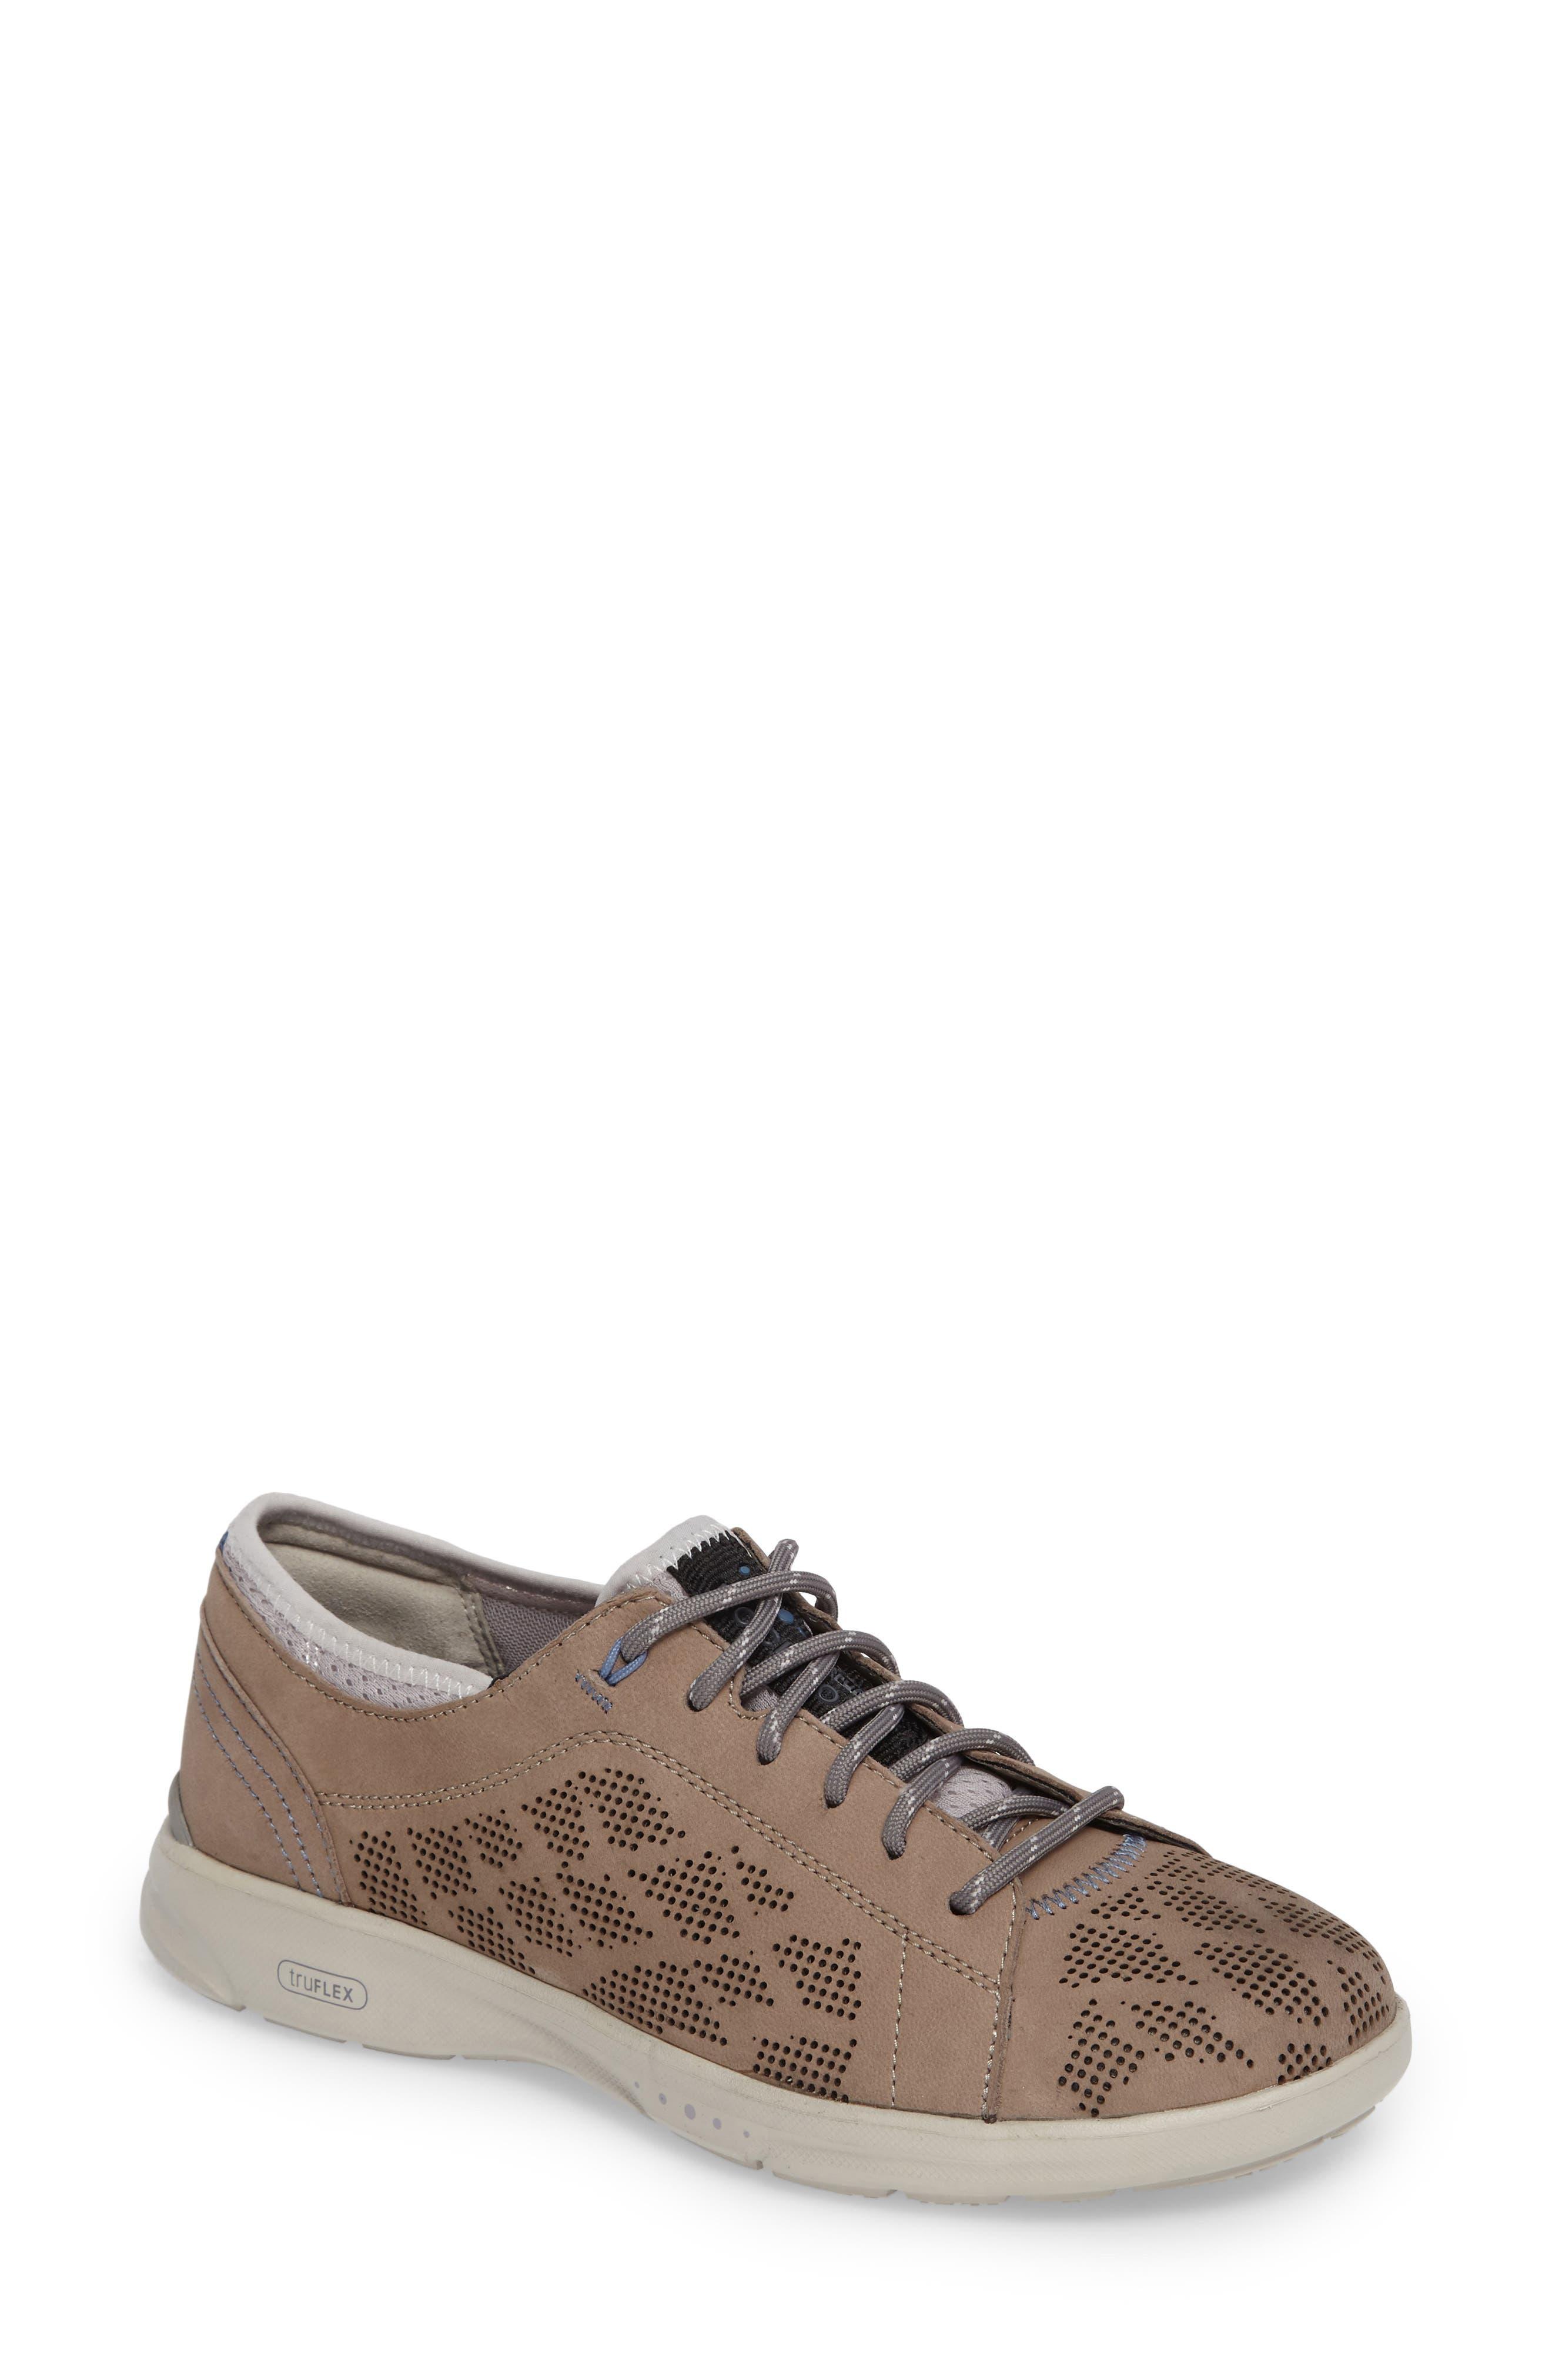 Alternate Image 1 Selected - Rockport truFLEX Perforated Sneaker (Women)